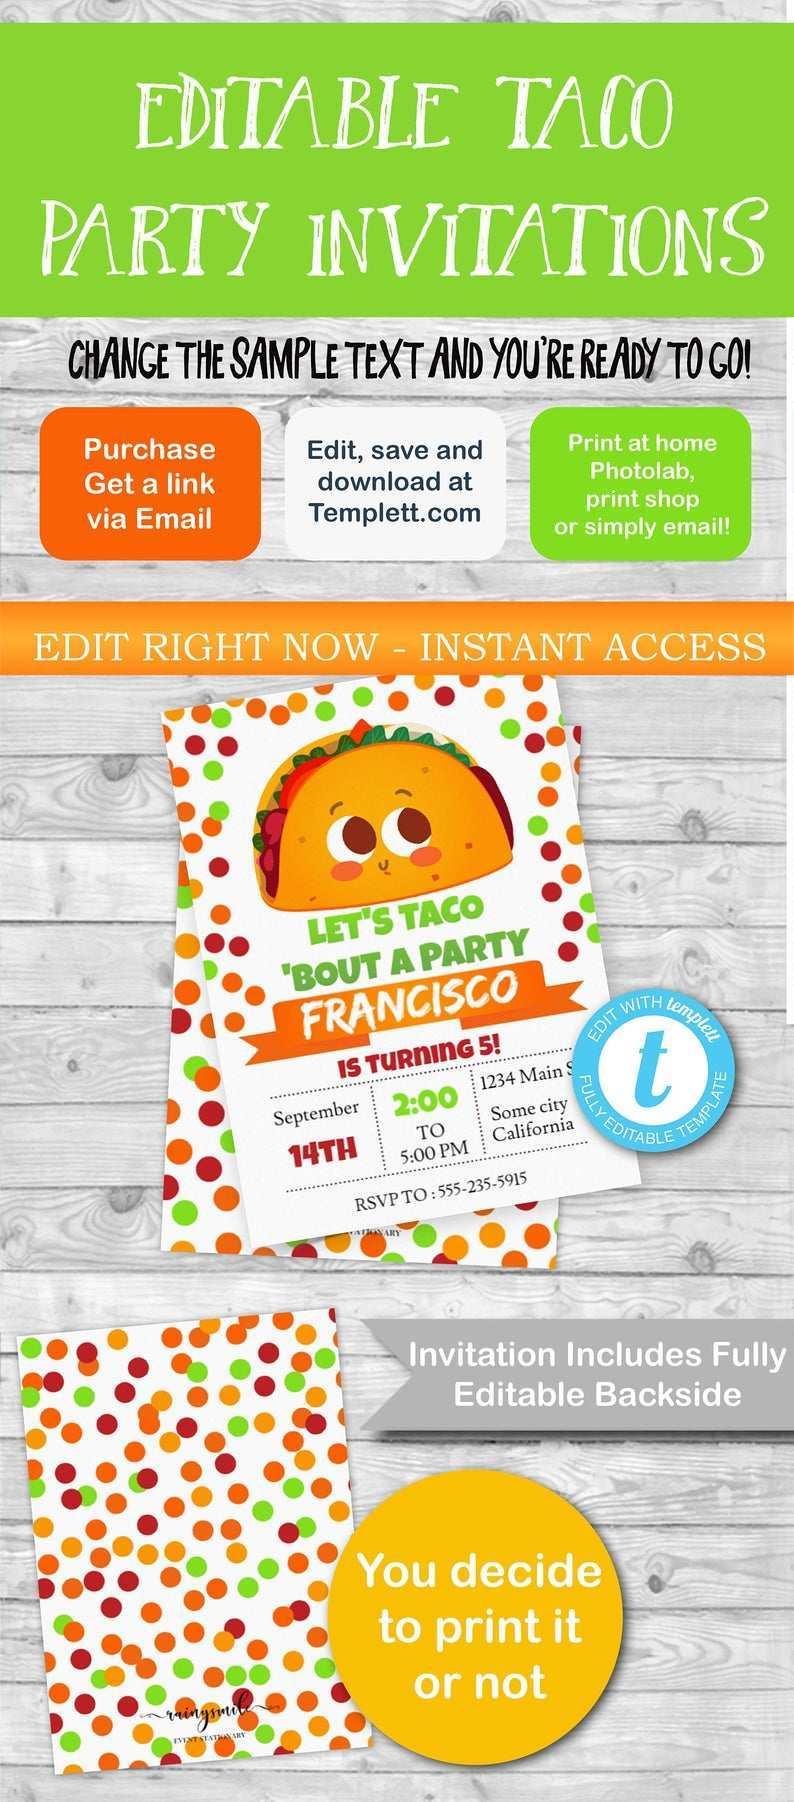 66 Blank Taco Party Invitation Template Free PSD File for Taco Party Invitation Template Free